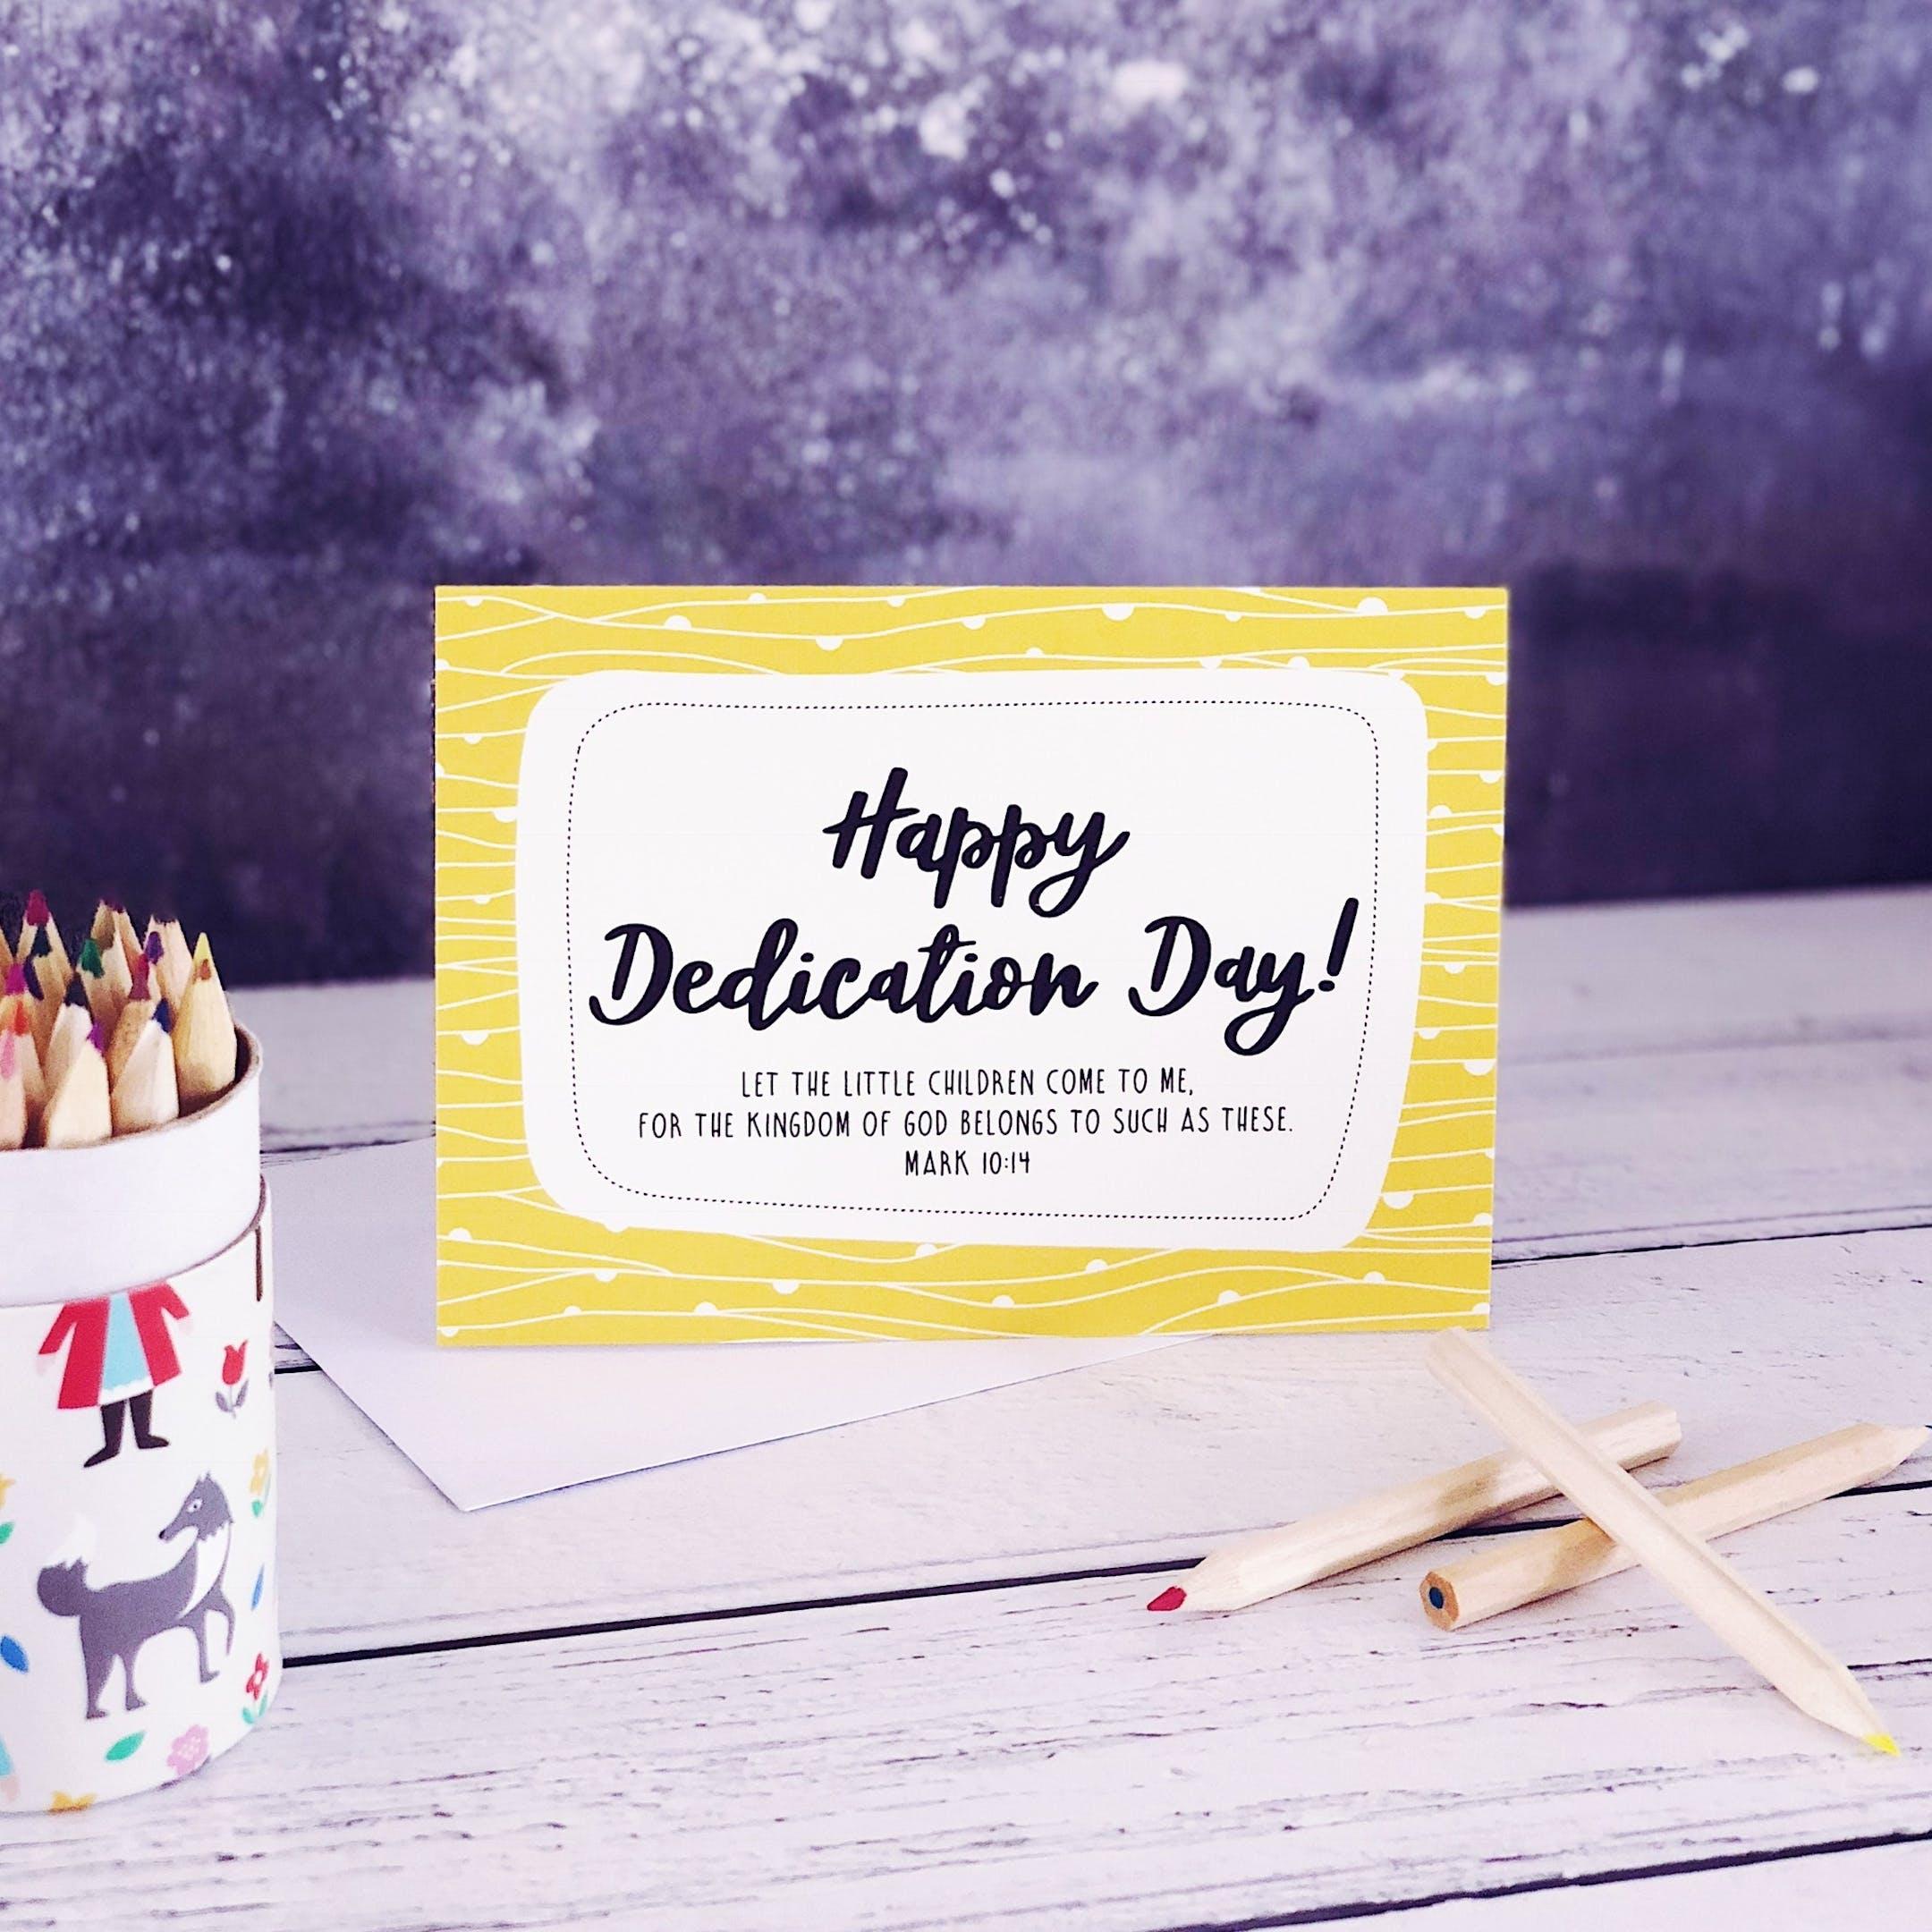 Happy Dedication Day! - Mark 10:14 Card - Izzy and Pop